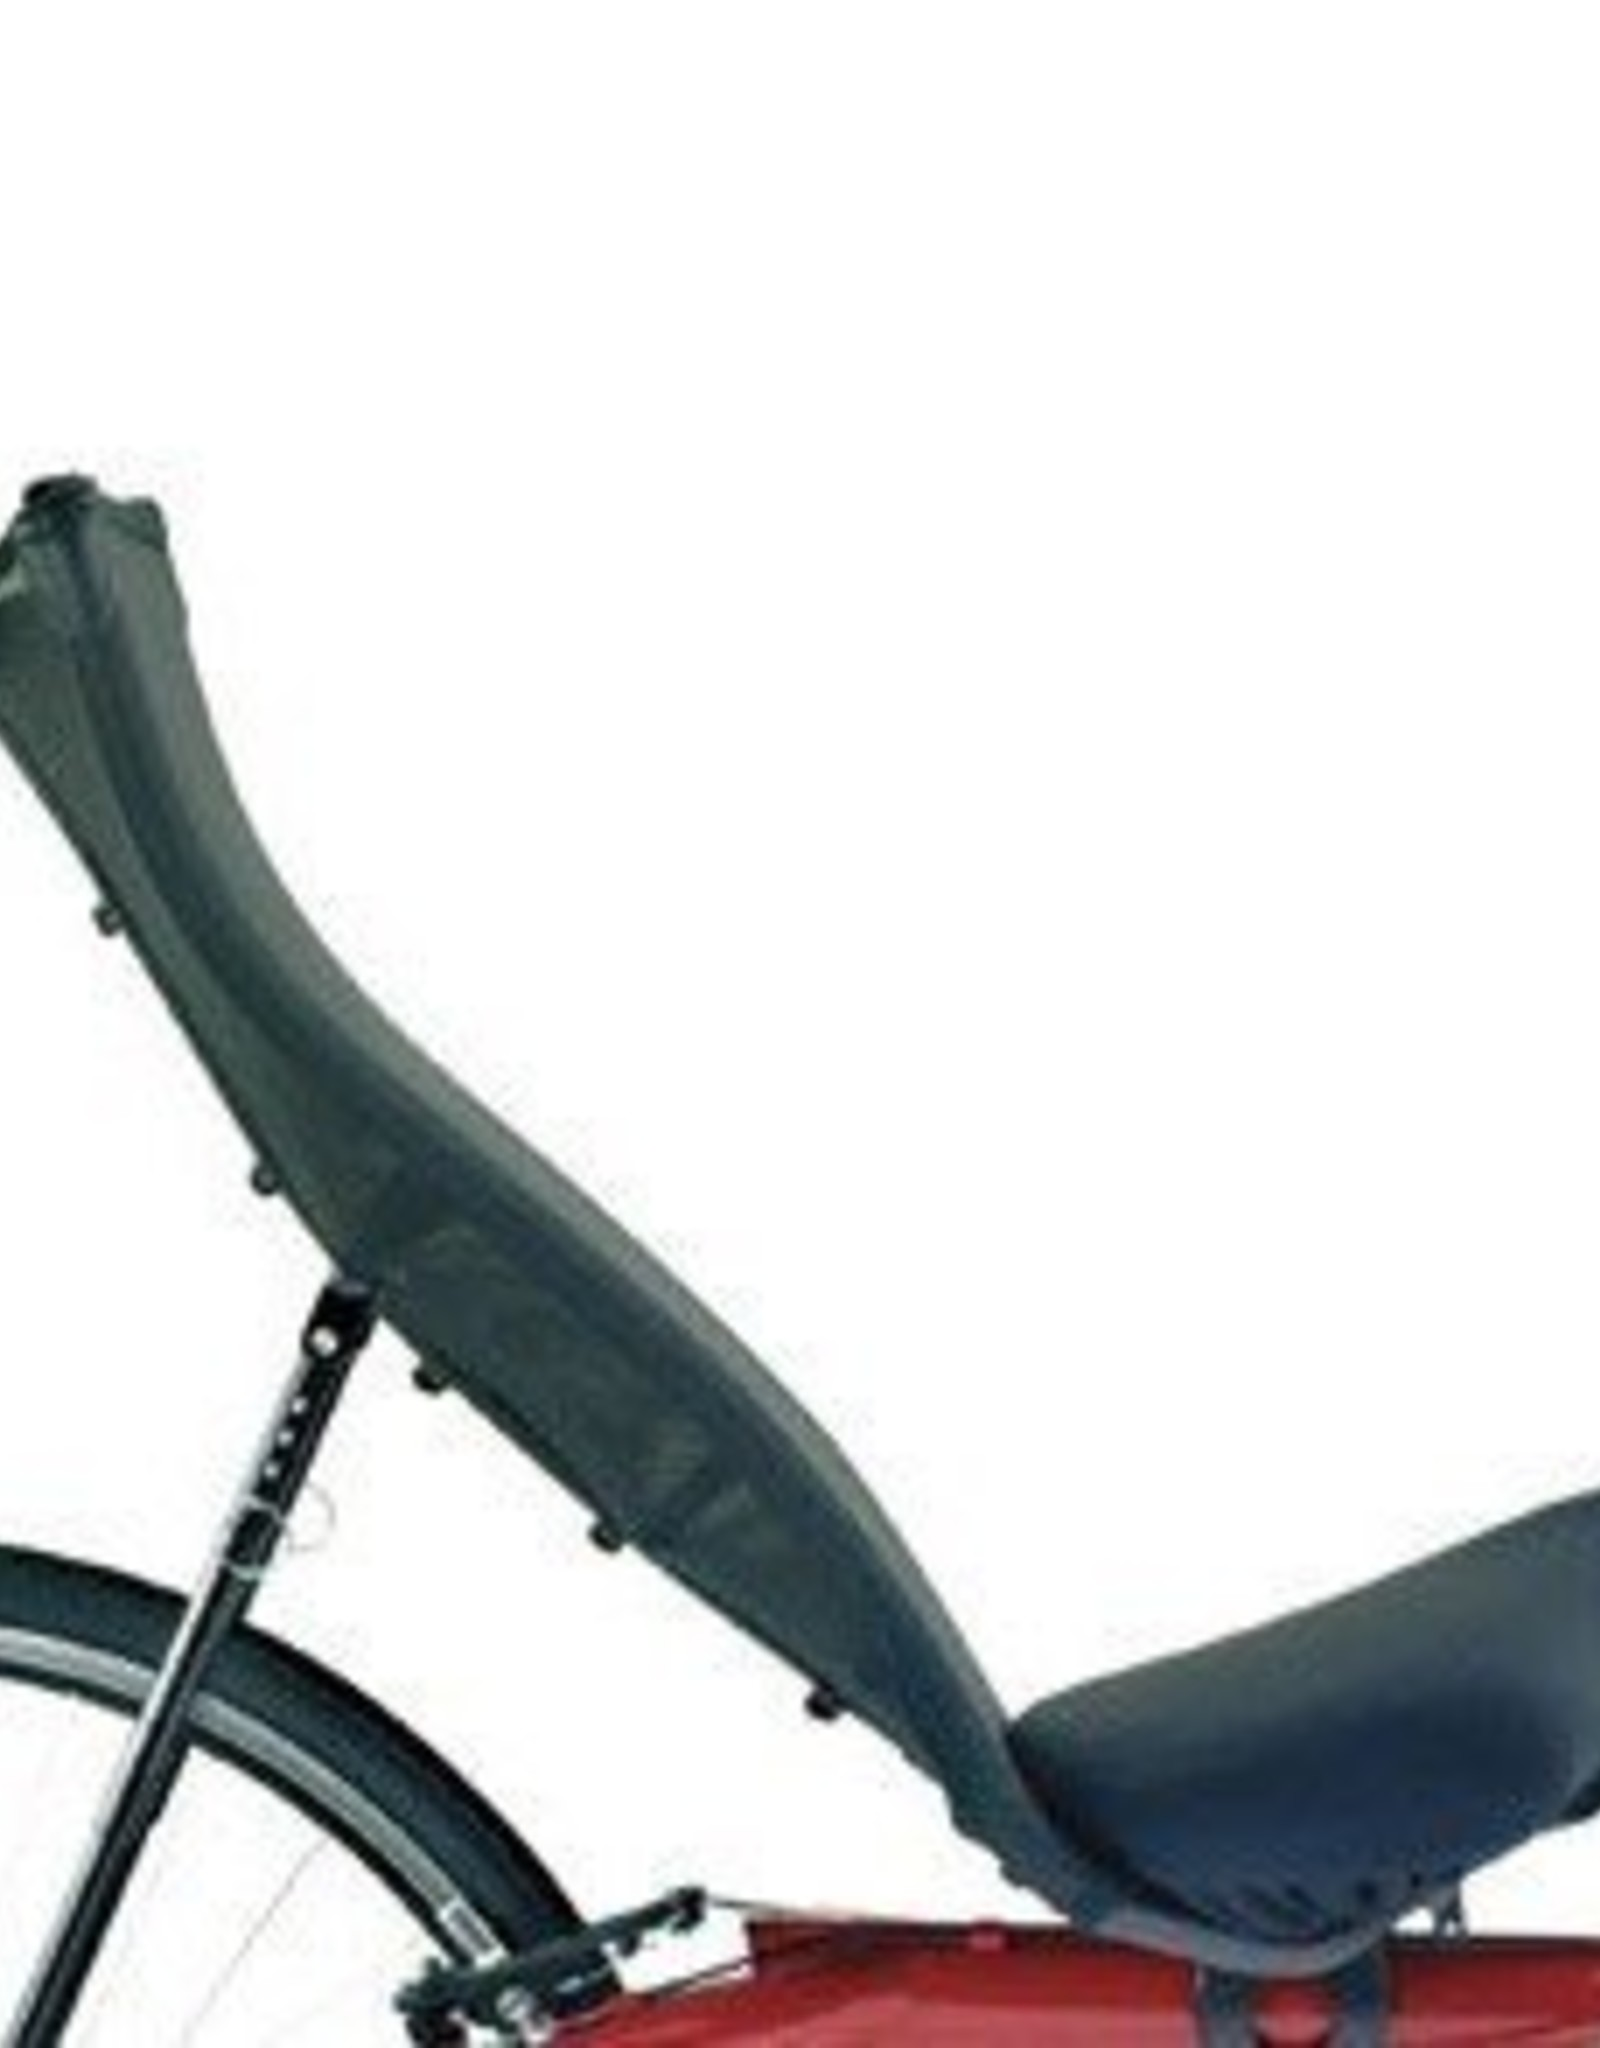 Bacchetta Recurve Seat